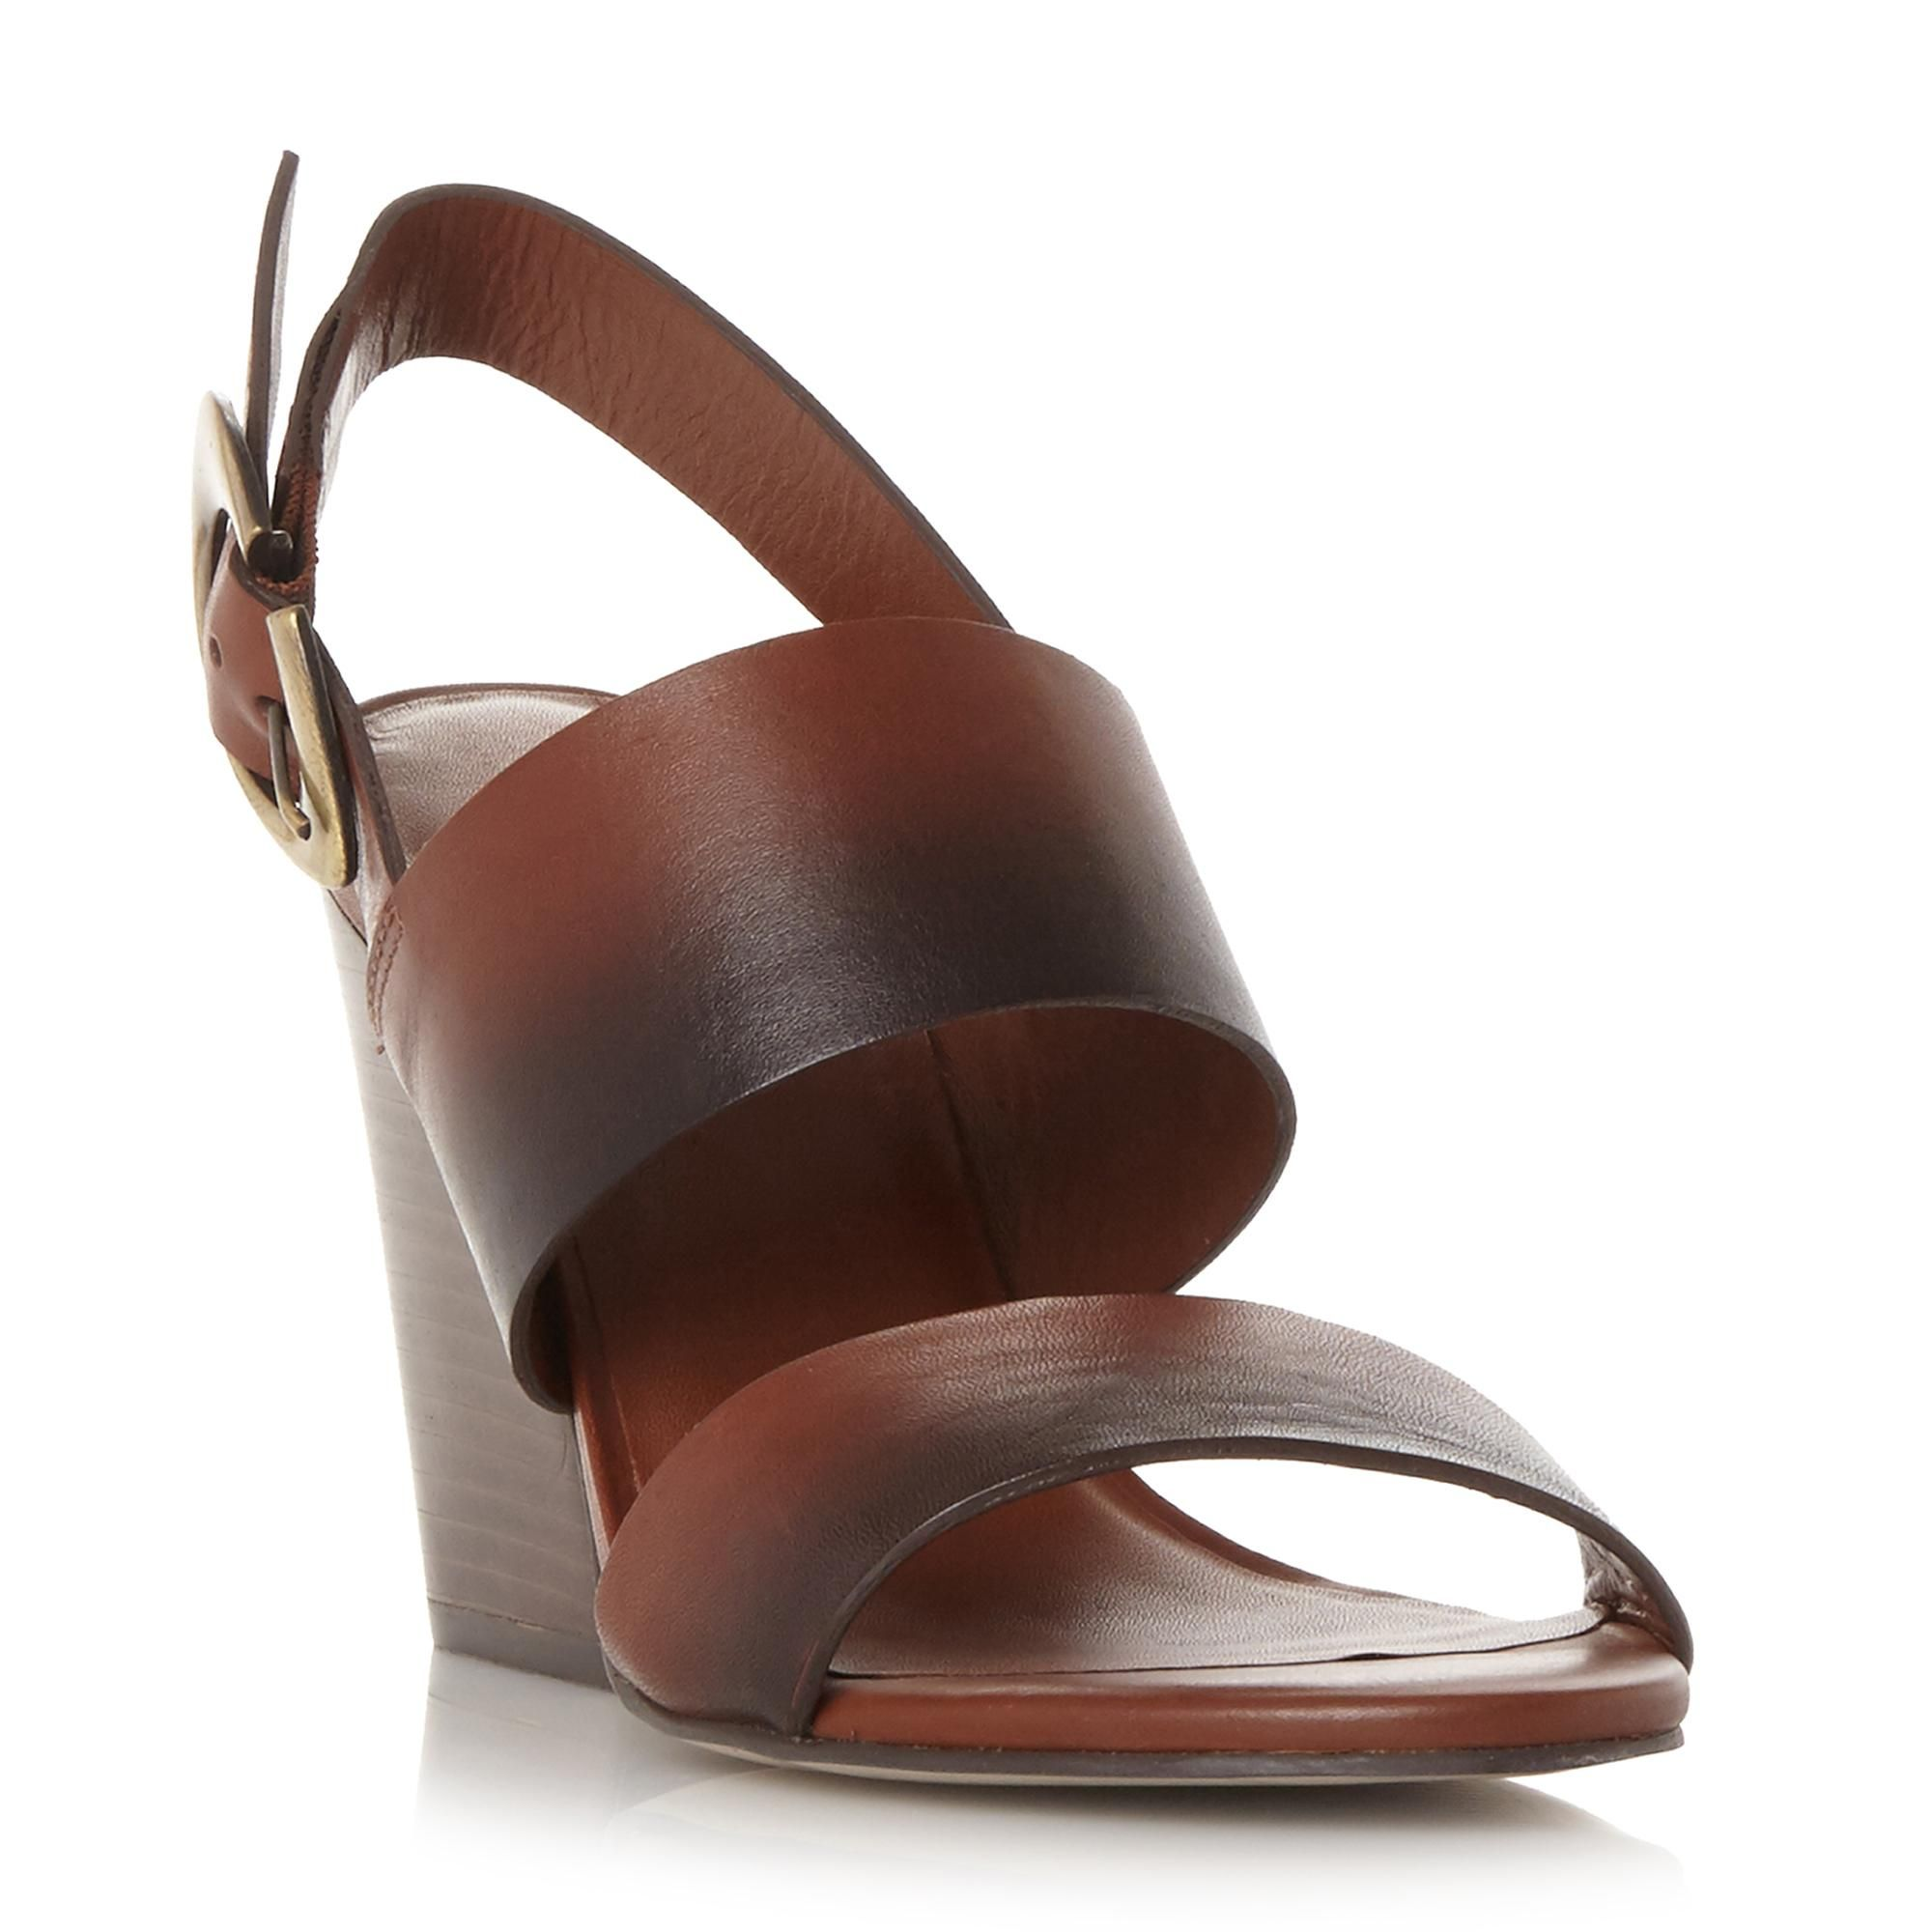 c3f3db7f6 DUNE BLACK LADIES JAVAR - Tapered Block Heel Sandal - dark tan